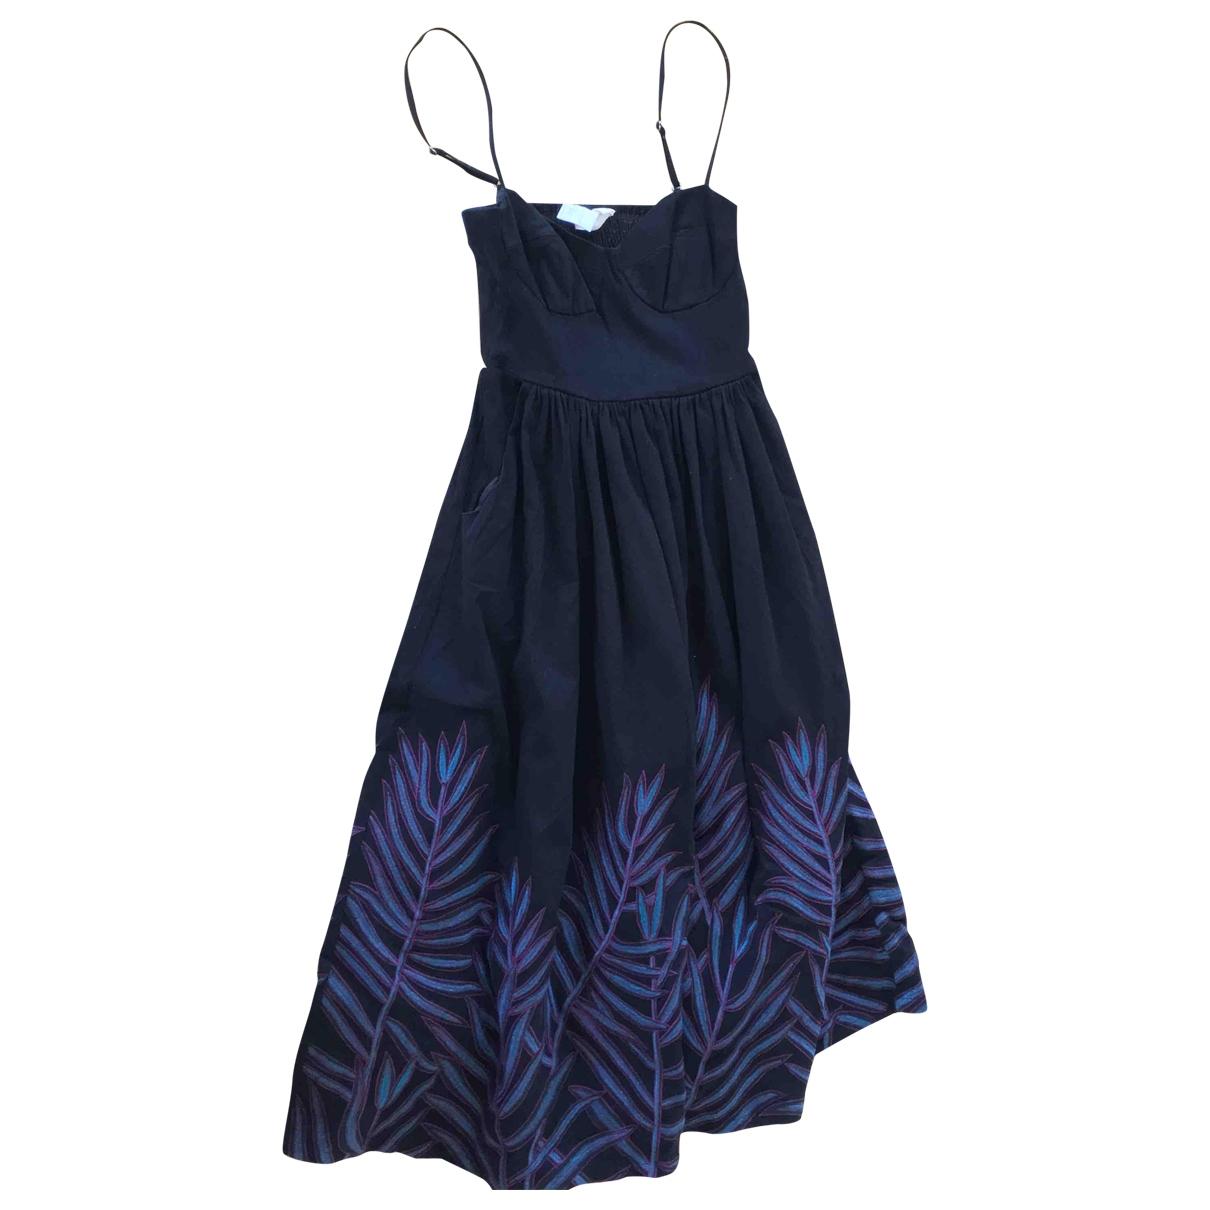 Mara Hoffman \N Black Cotton dress for Women 38 FR